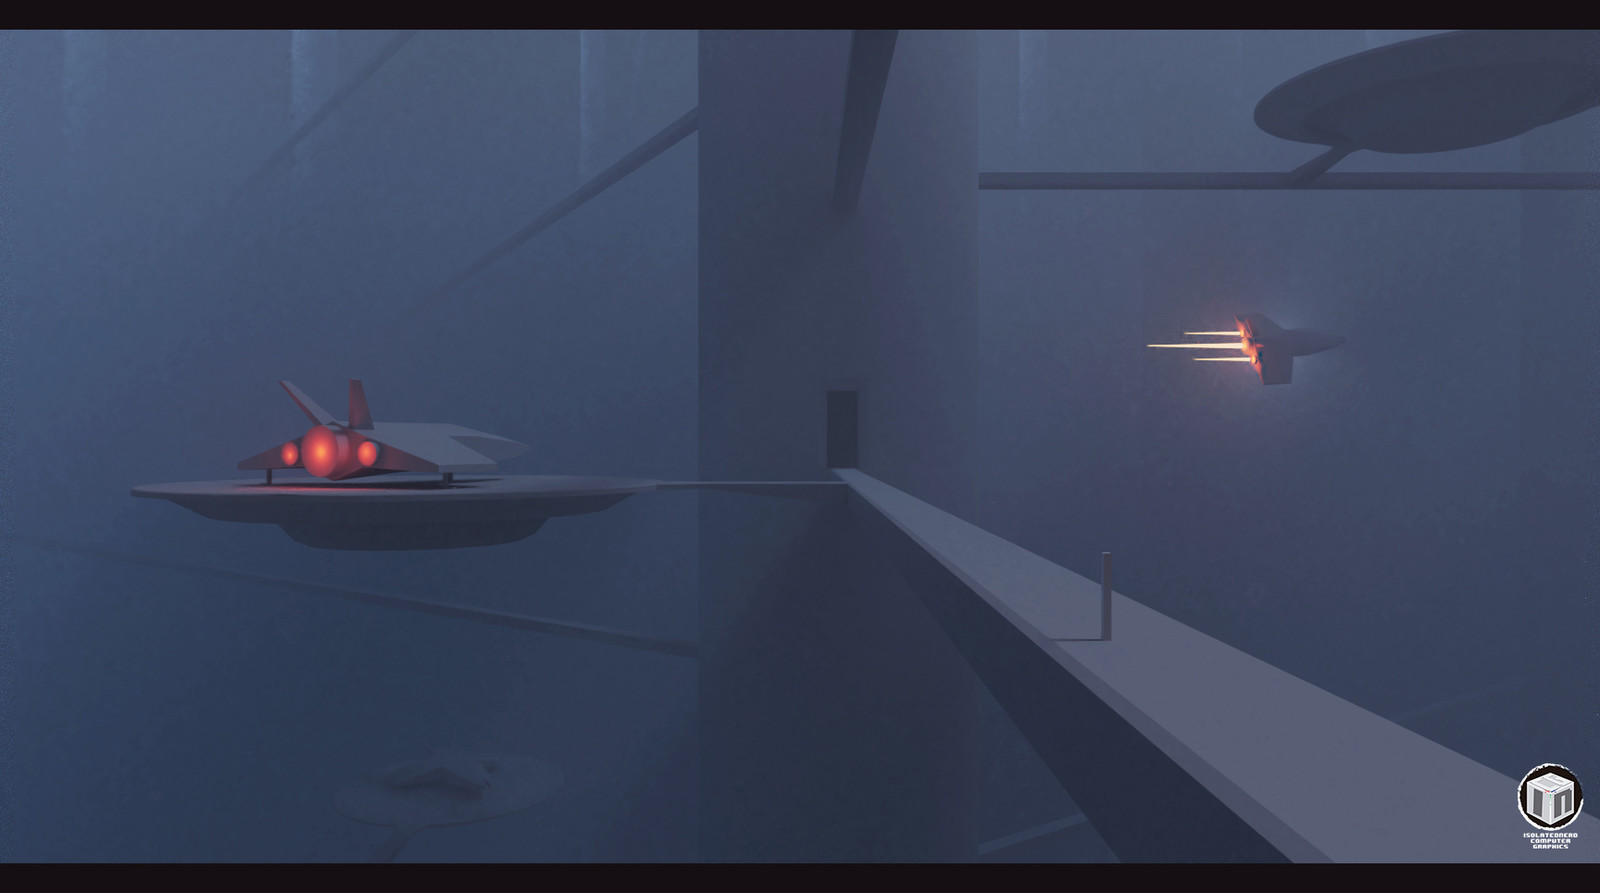 Scifi Excersice 001 - Landing Port